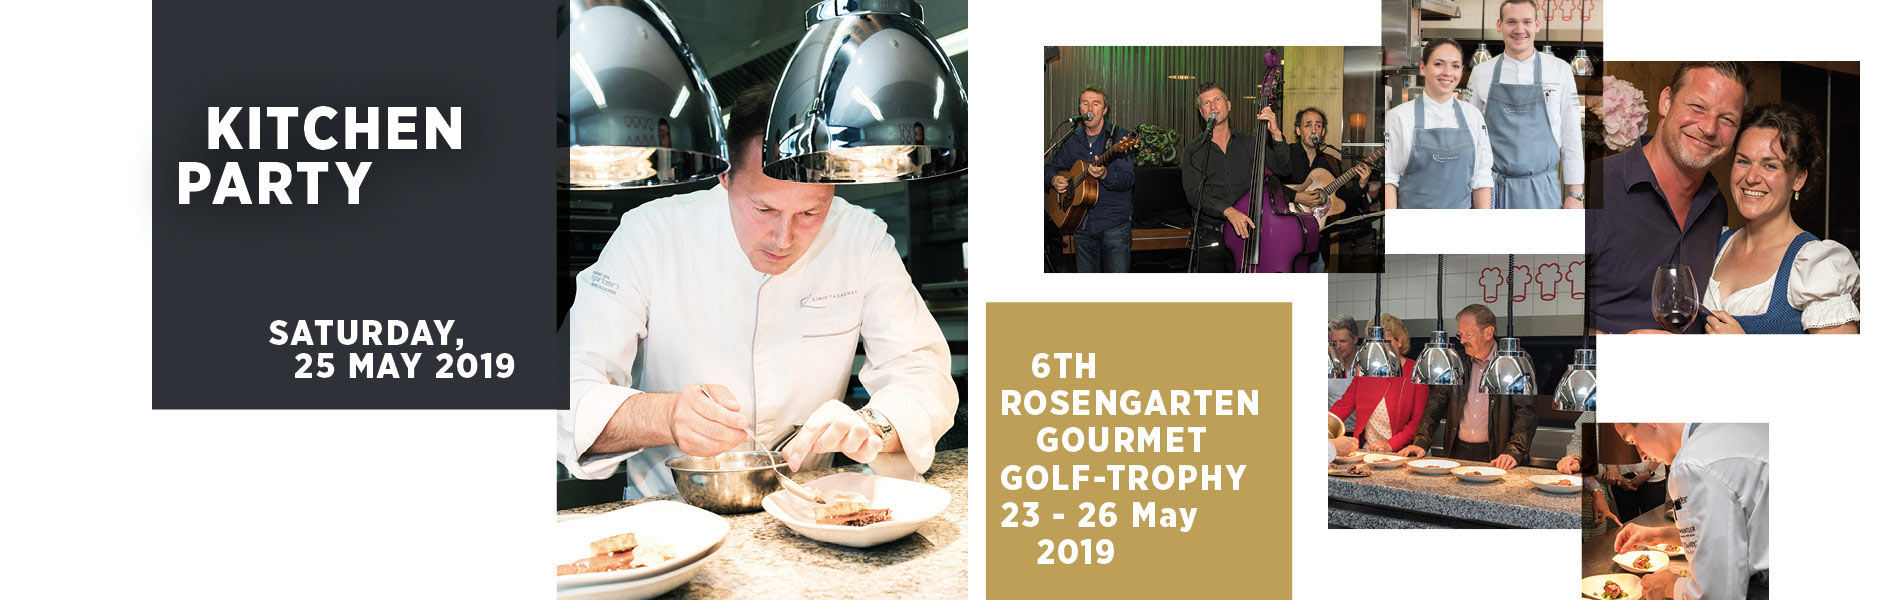 Gourmet Golf Trophy 5 star hotel Rosengarten Kirchberg Tyrol Austria kitchen party